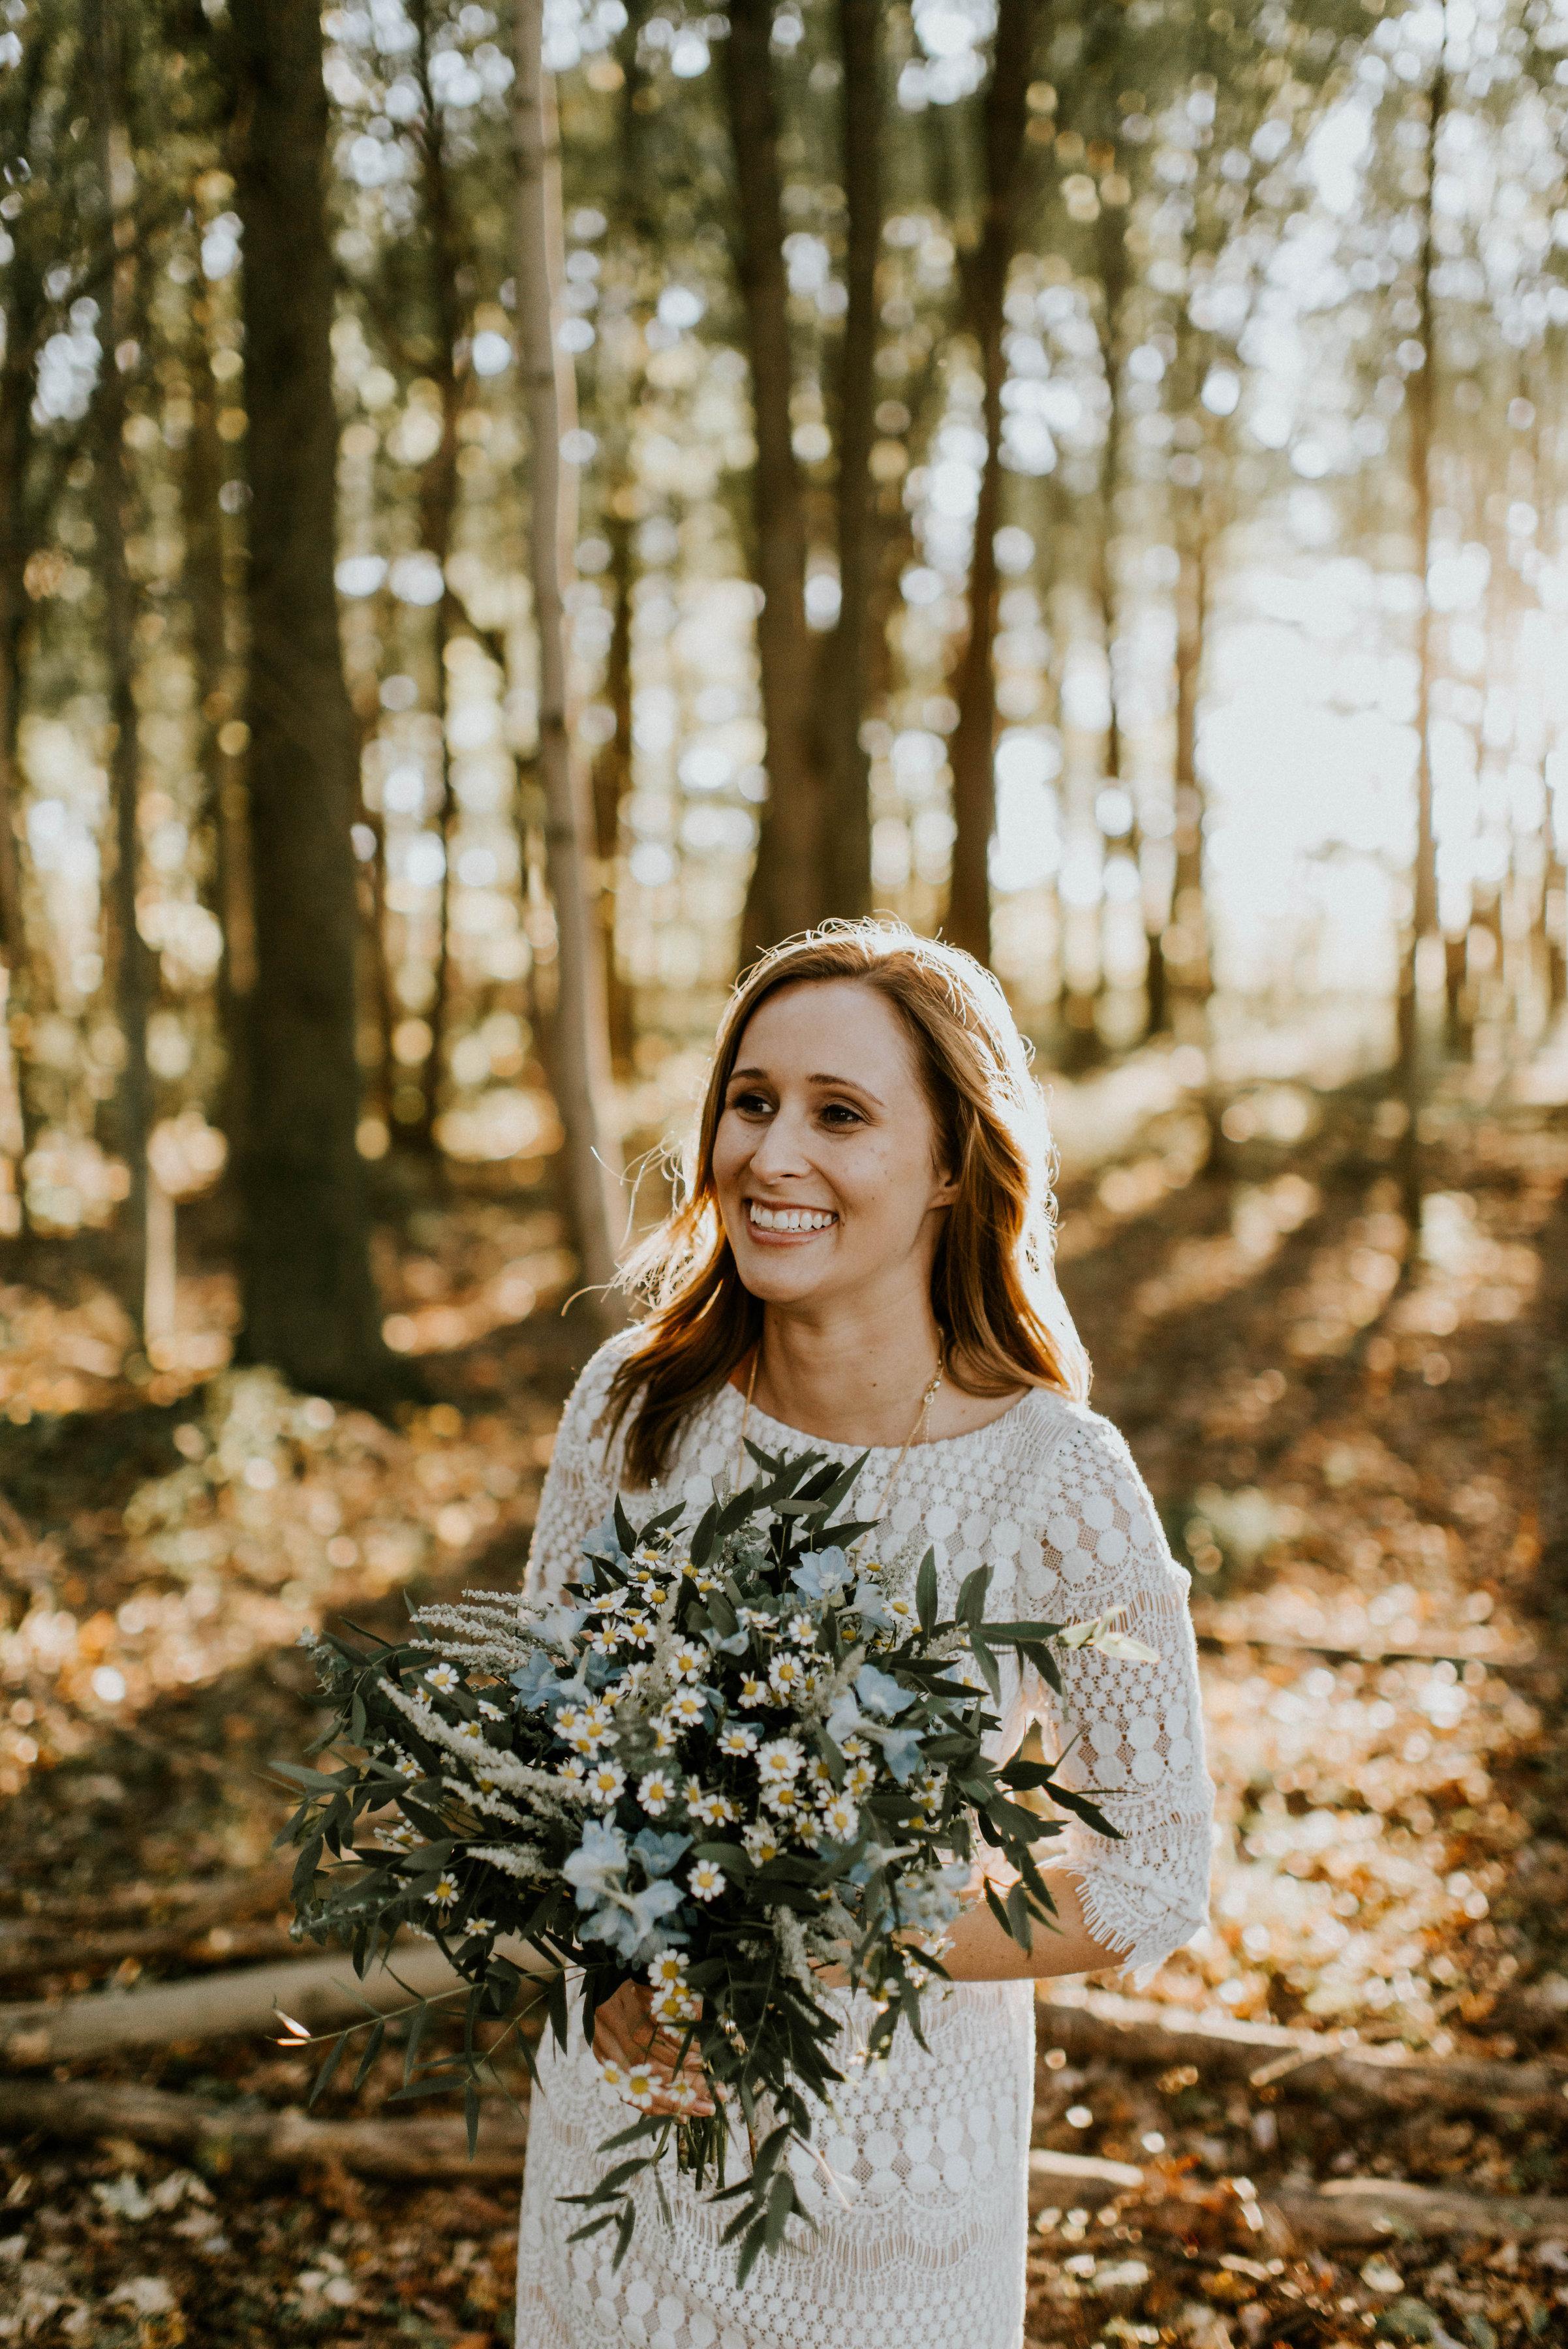 Wildflower-Field-Elopement-Vow-Renewal_Lisa+Chad_MJPHOTO-114.JPG